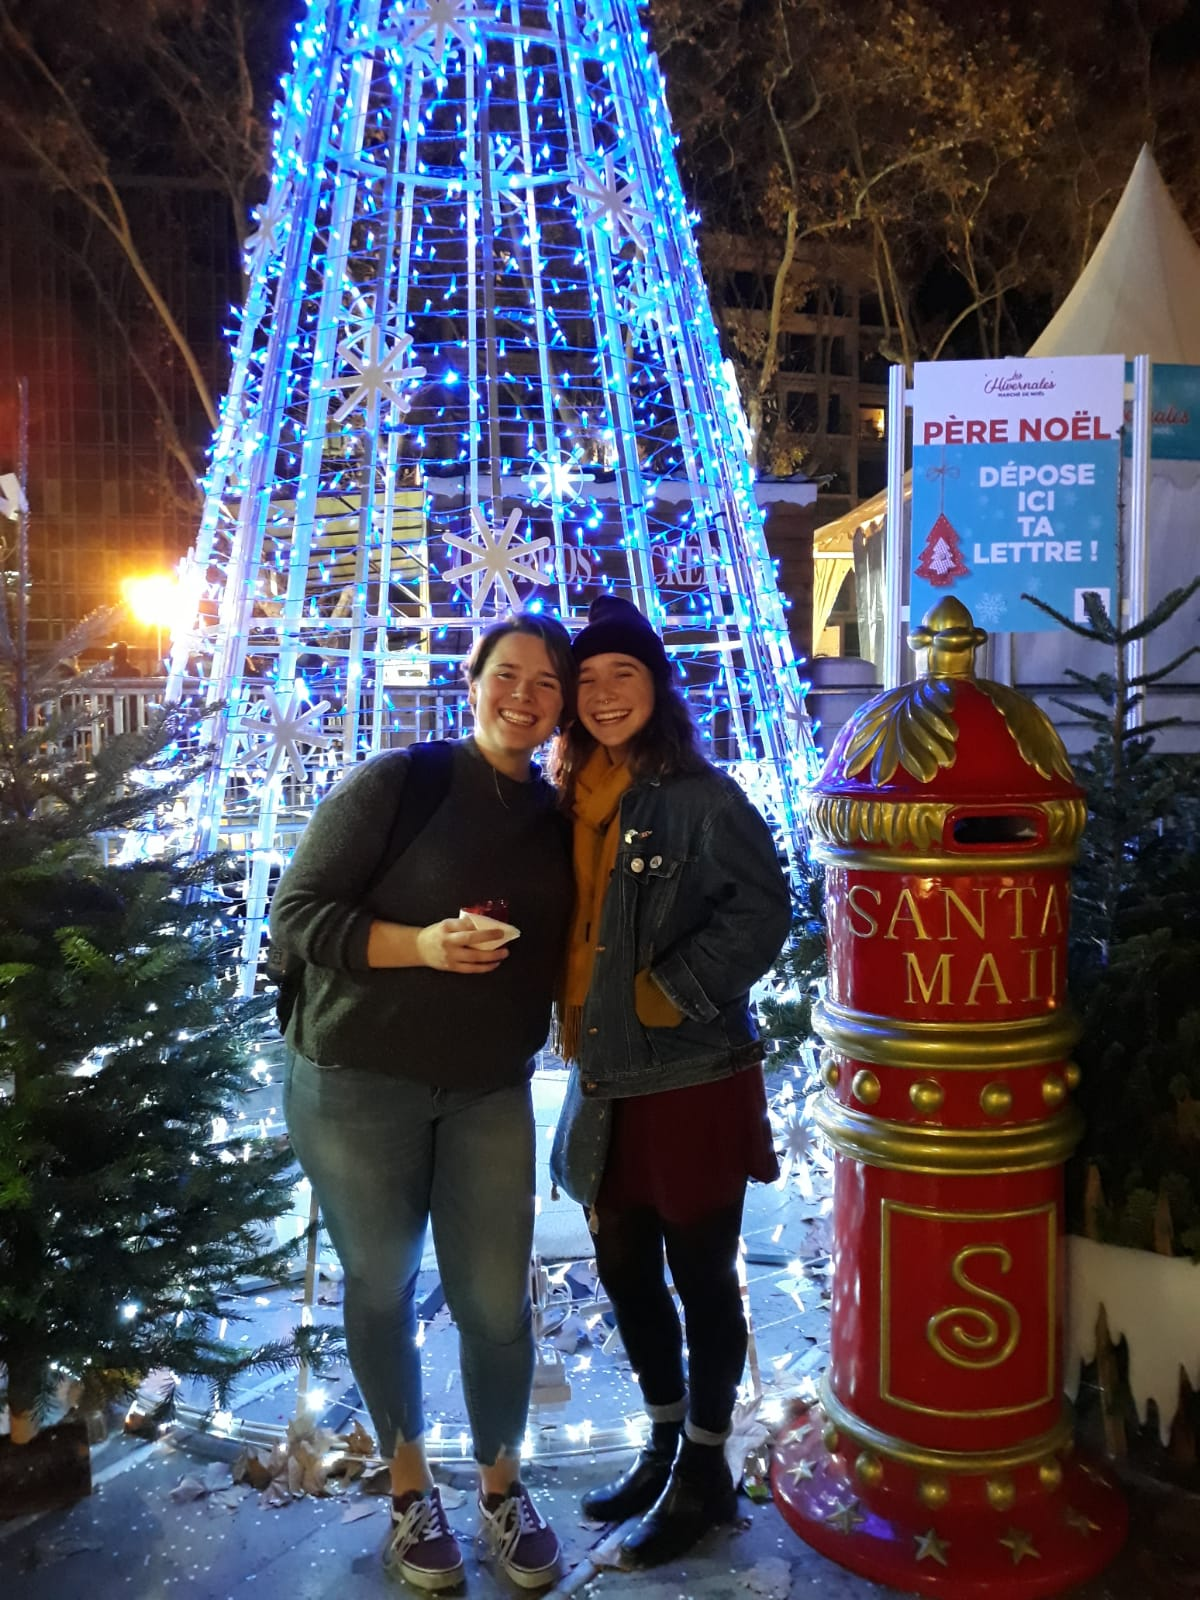 Photo courtesy of Lainie LaRonde '20 Lainie LaRonde '20 and Sarah Painting '20 at the Christmas market in la Place de la Comédie in Montpellier.